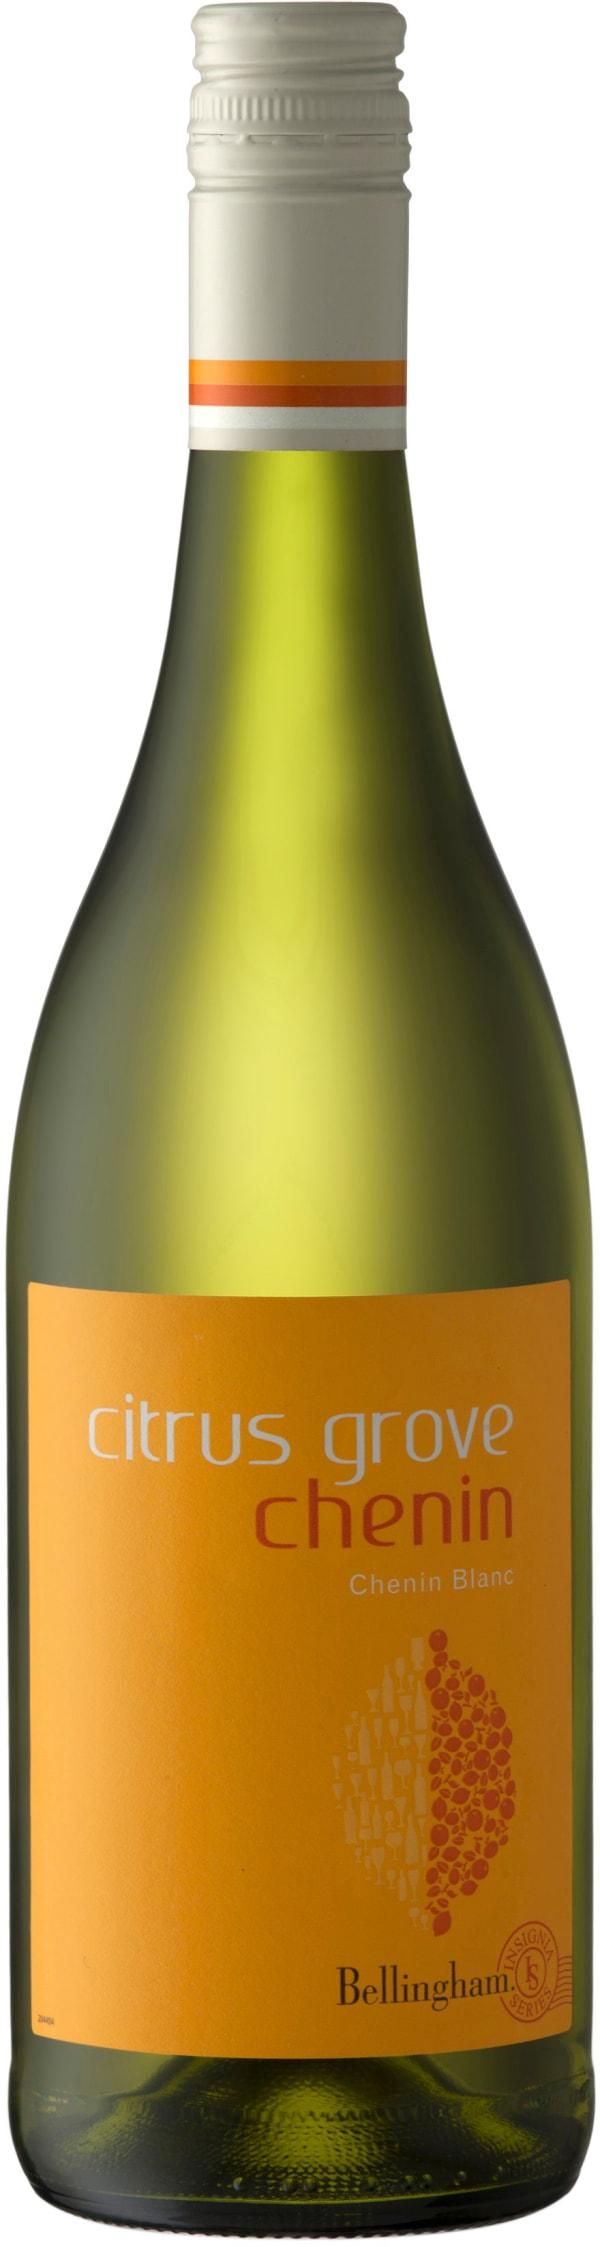 Bellingham Citrus Grove Chenin Blanc 2017